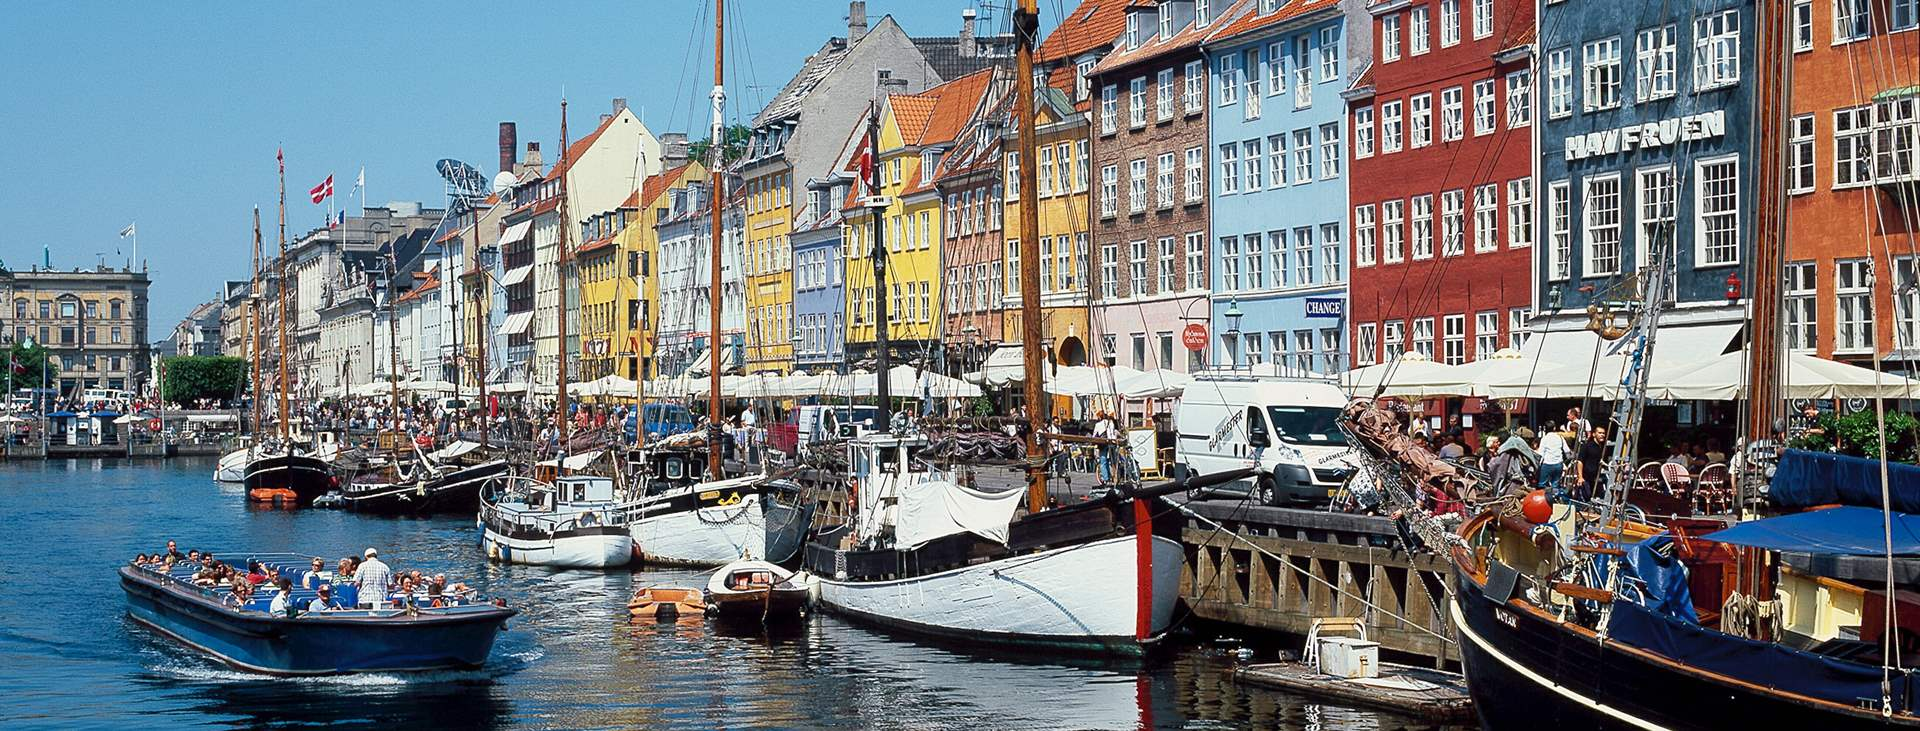 Bestill en reise til København med Ving